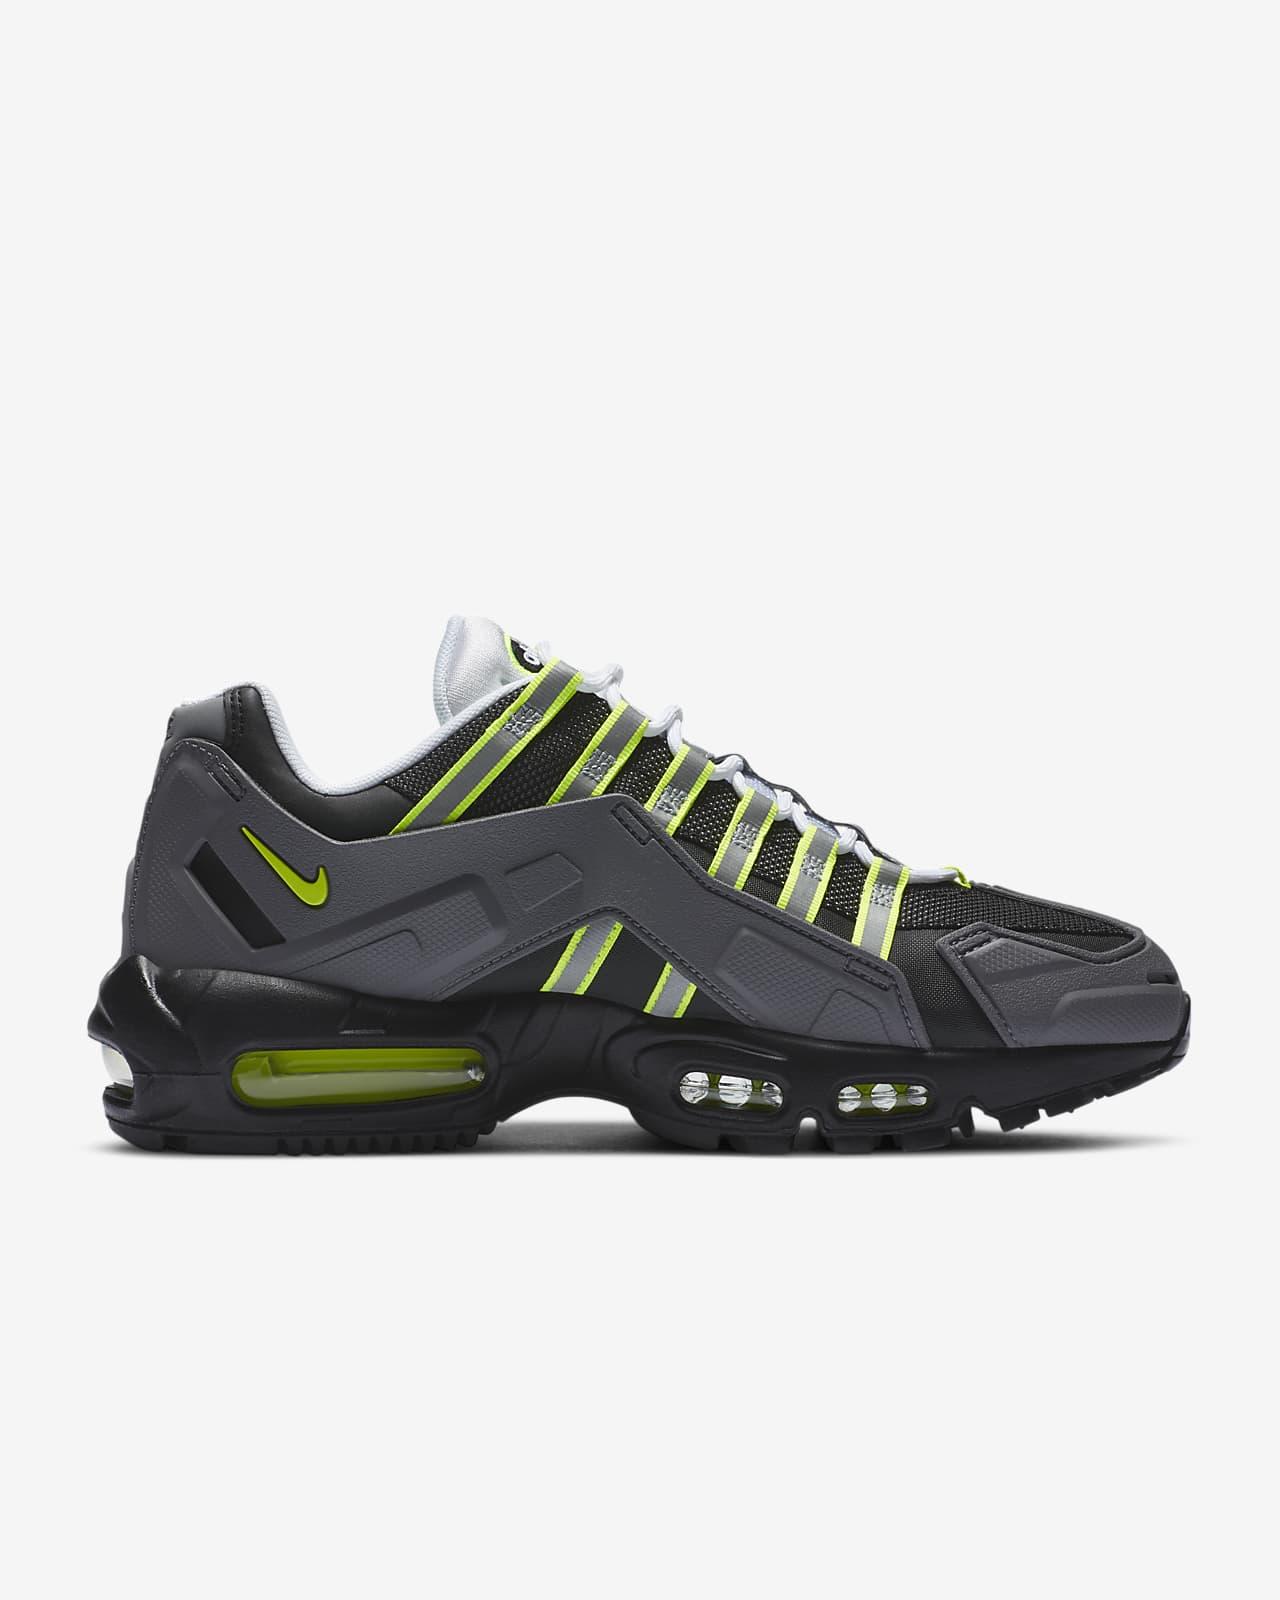 Chaussure Nike Air Max 95 NDSTRKT pour Homme. Nike LU